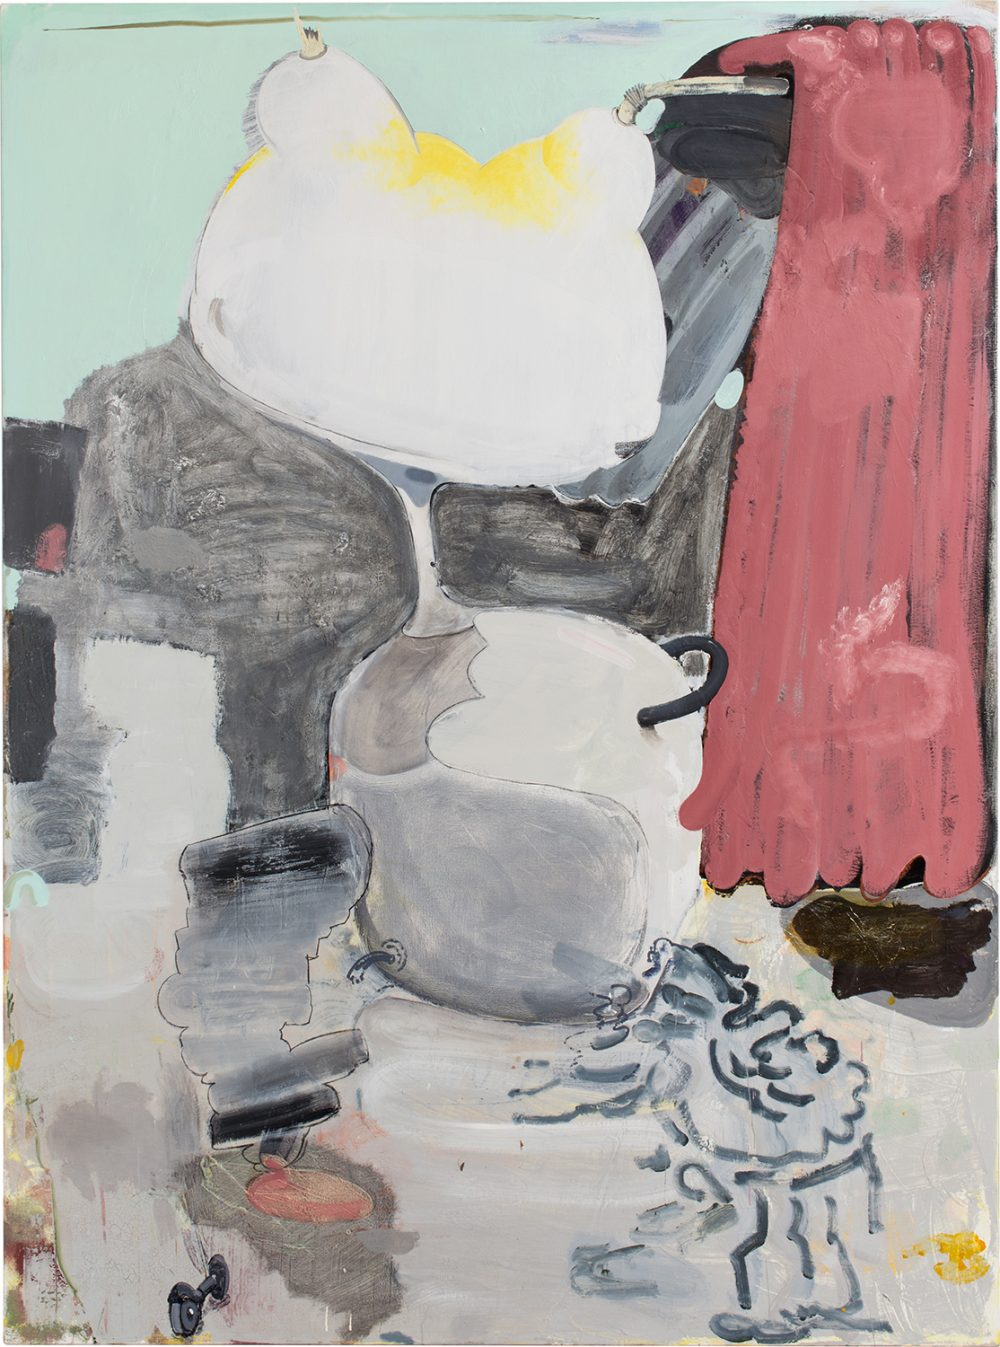 o.T. 62 (2017), Öl, Lack, Kohle auf Leinwand, 250 x 185 cm